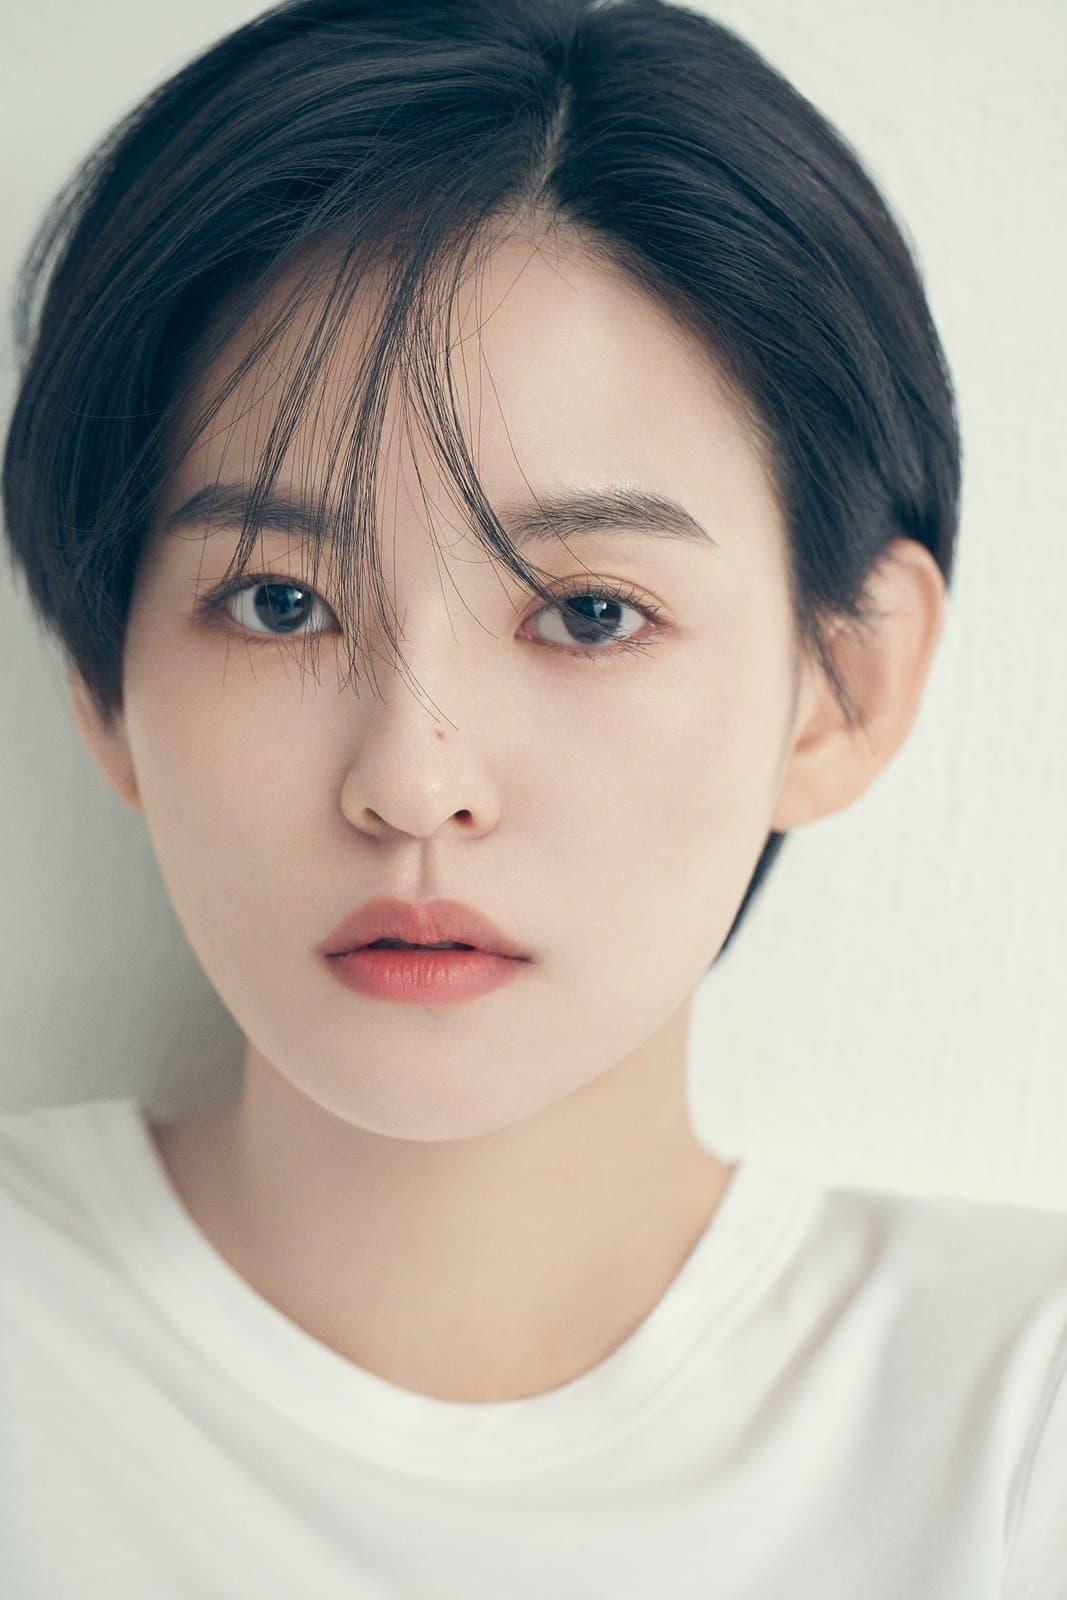 Kim Yoon-hye